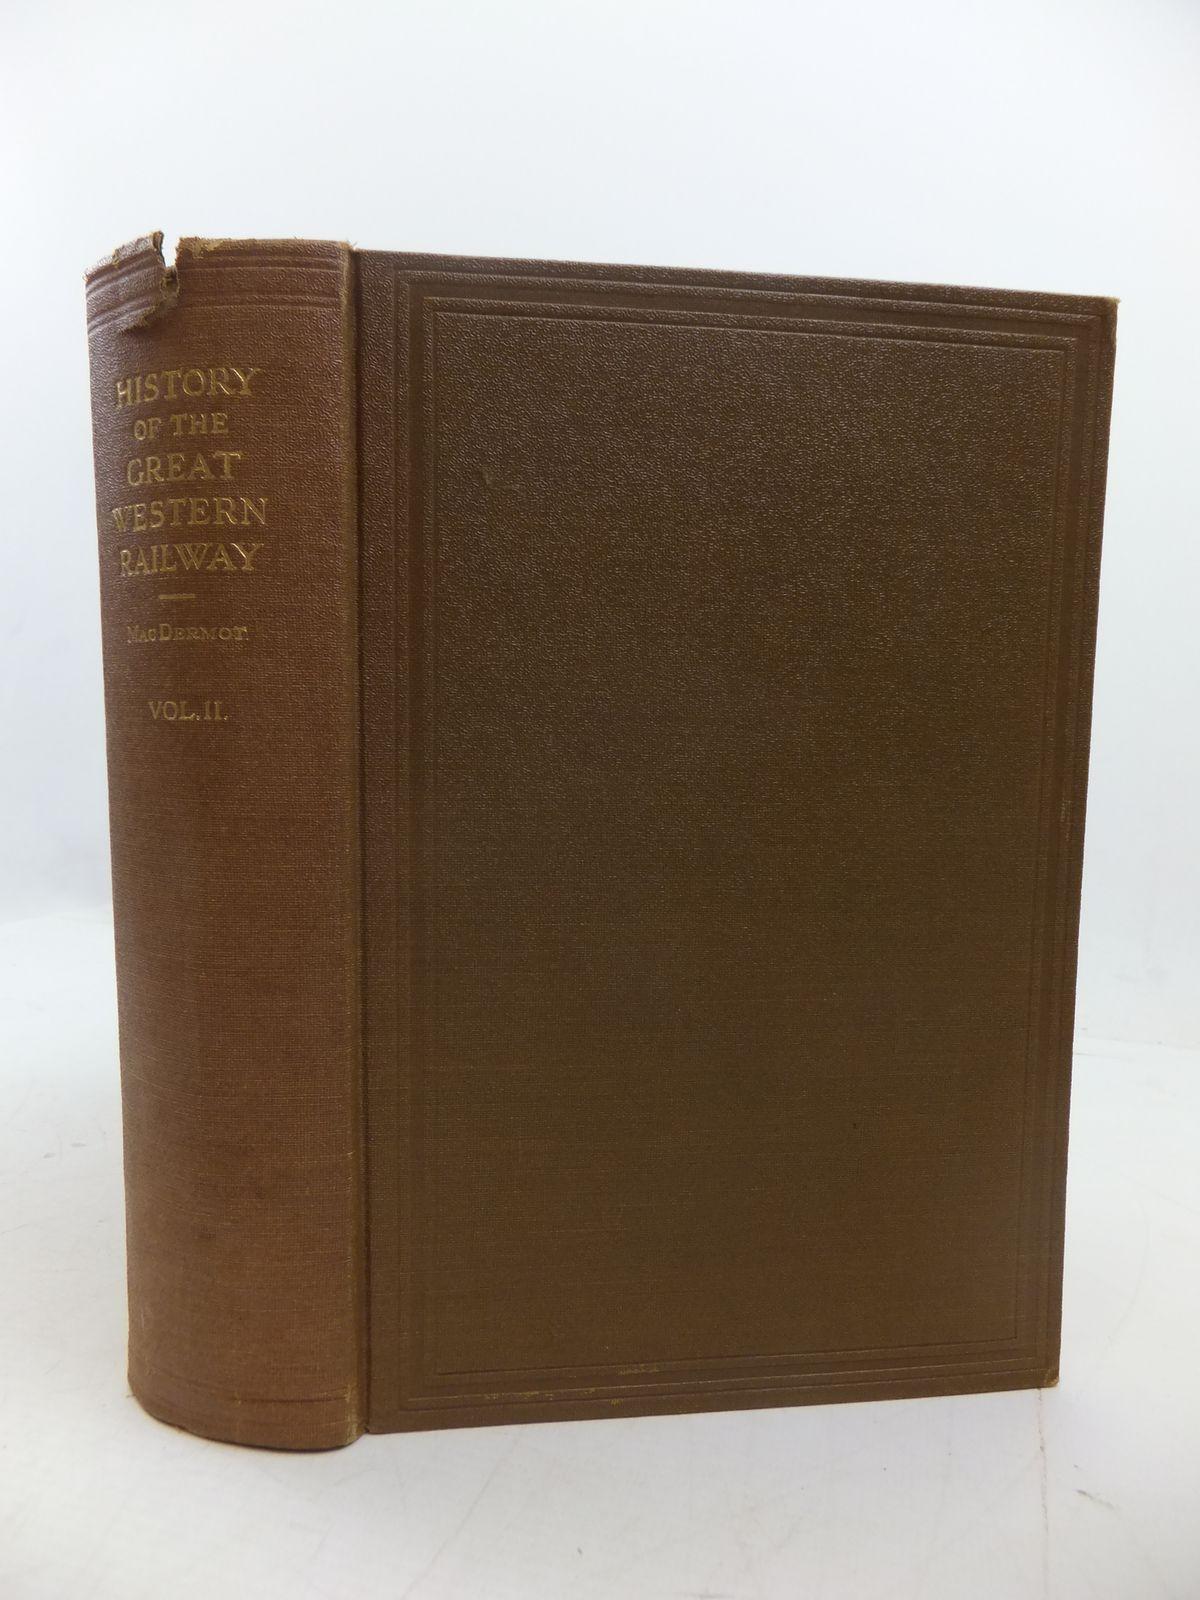 Photo of HISTORY OF THE GREAT WESTERN RAILWAY VOL II 1863-1921